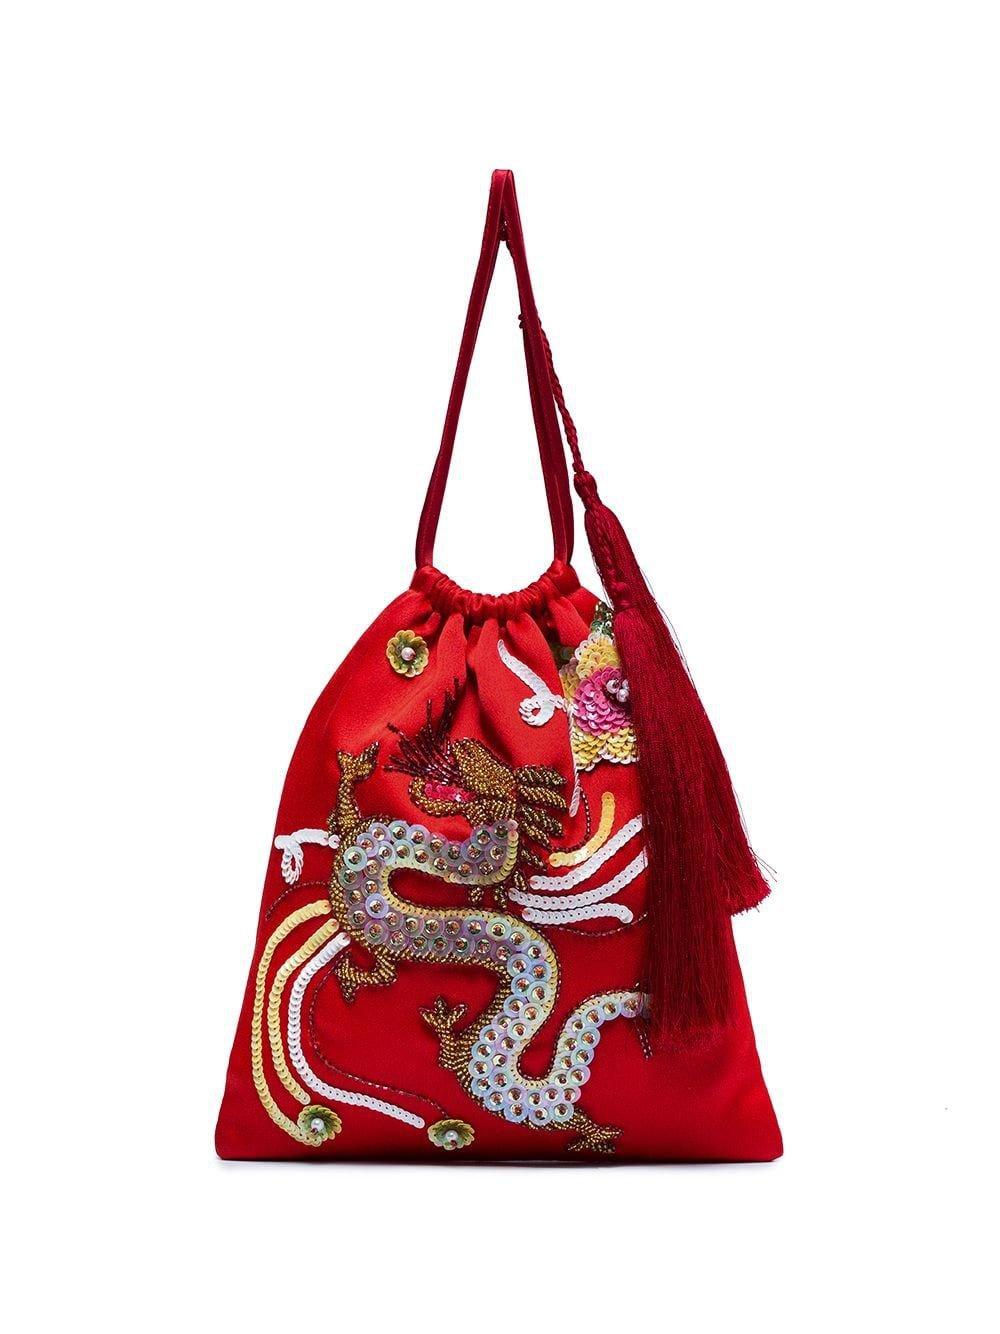 Red Dragon Motif Handbag